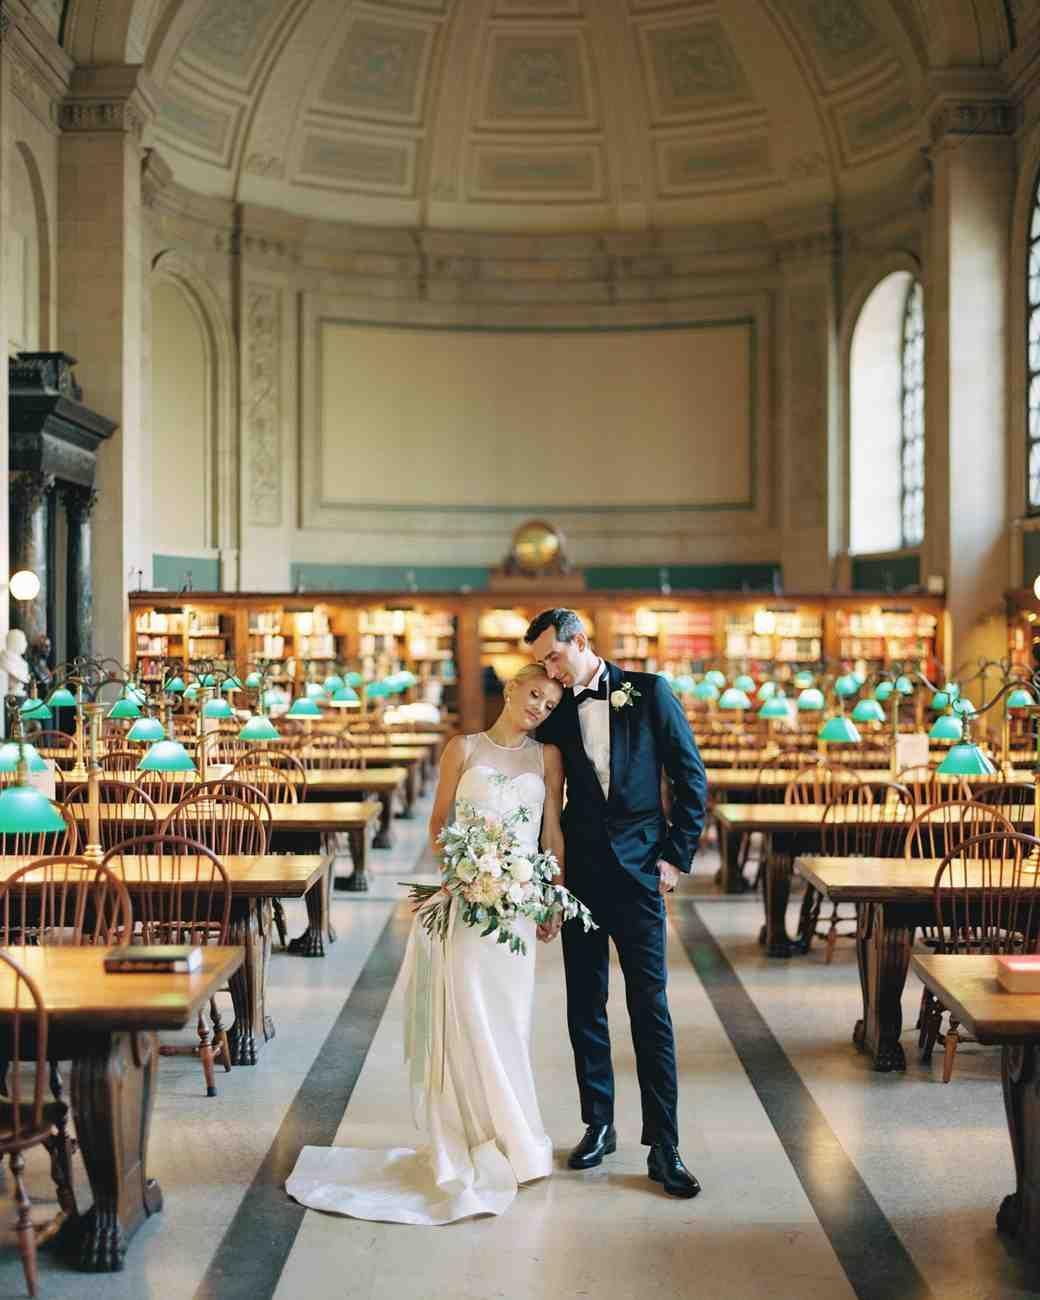 A Classic Boston Public Library Wedding Boston Public Library Wedding Library Wedding Easy Wedding Planning